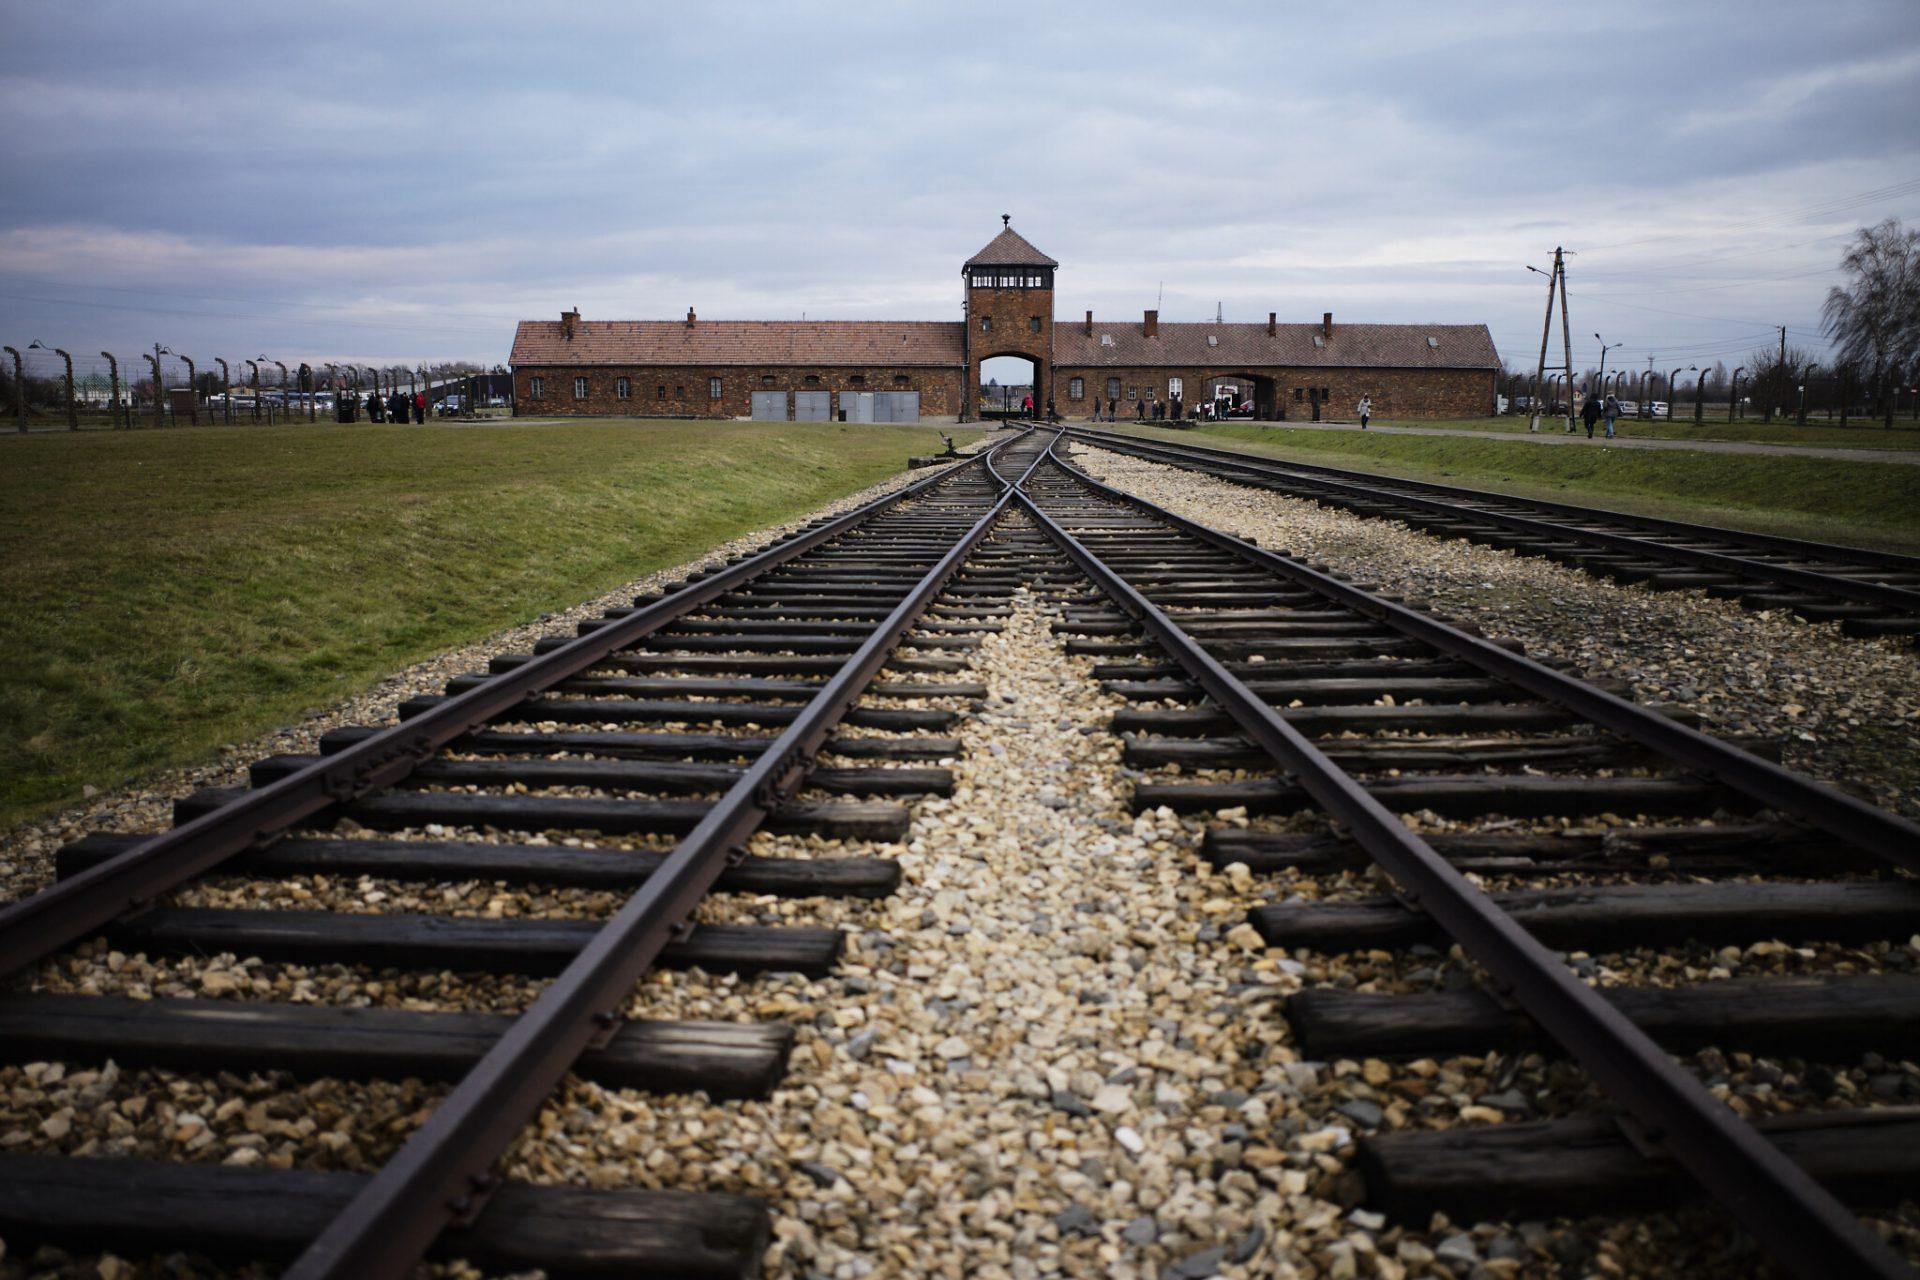 Editiadedimineata.ro: Anul acesta, marșul comemorativ de la Auschwitz se va desfășura virtual